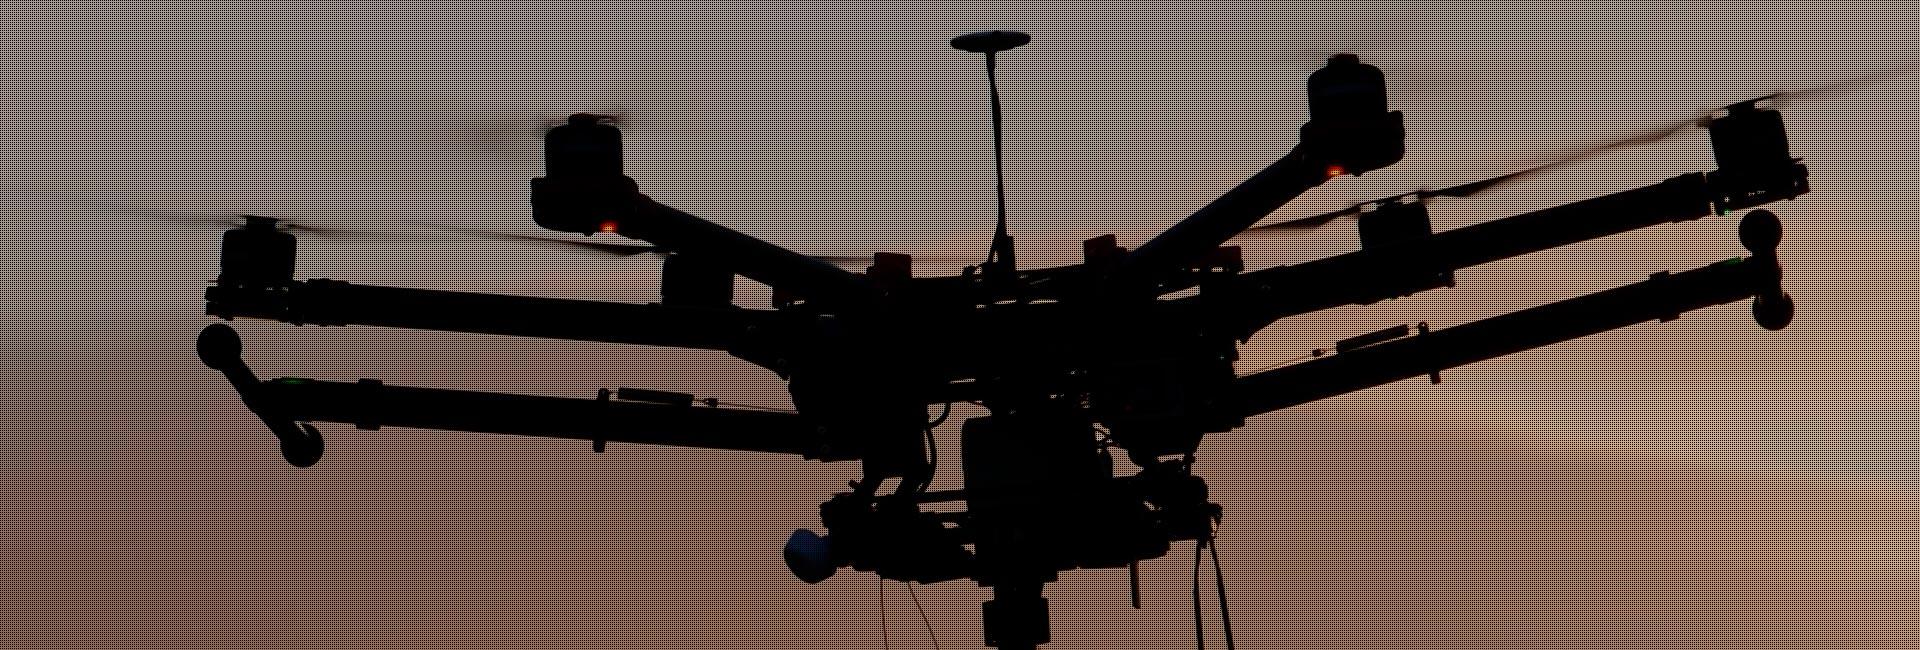 slide-drones-02